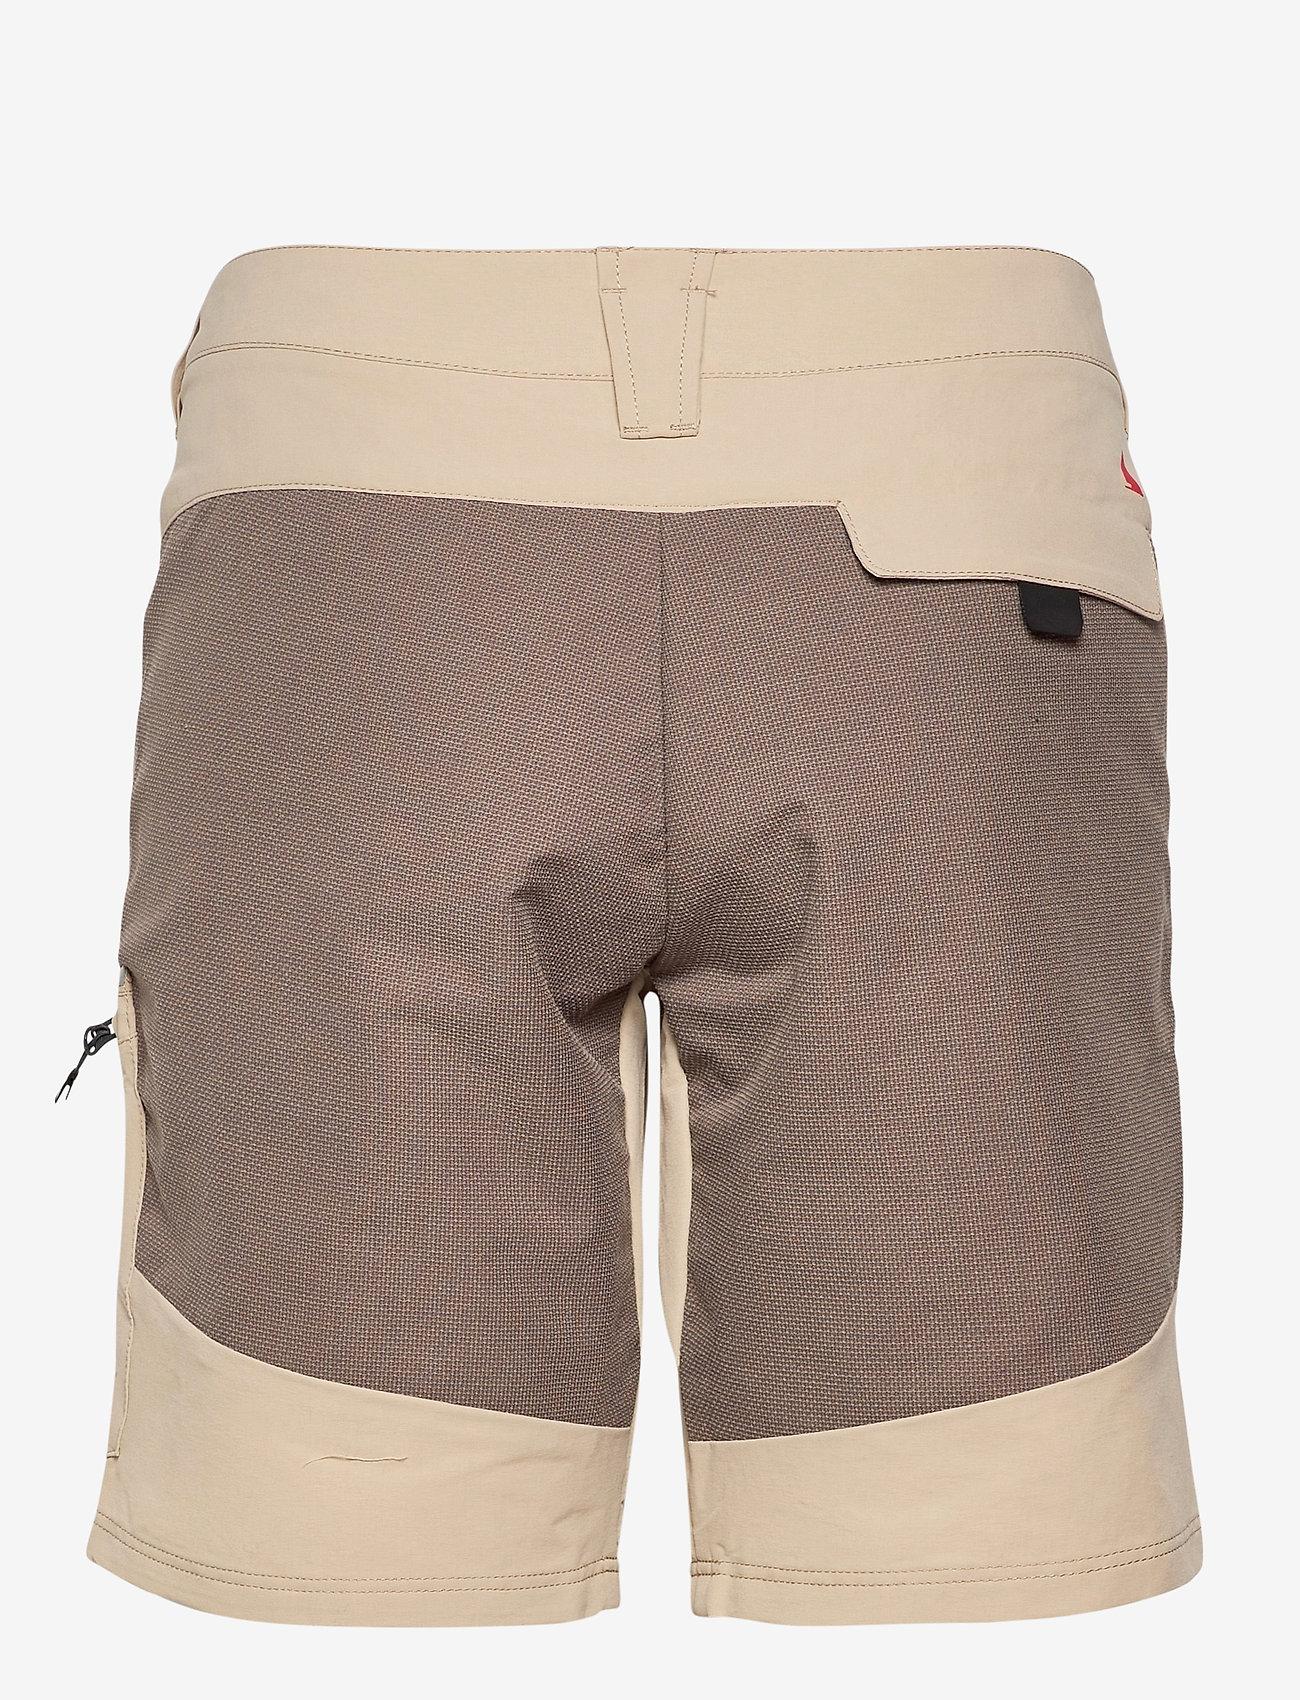 Musto - EVO PERFORMANCE SHORT 2.0 FW - training shorts - light stone - 1